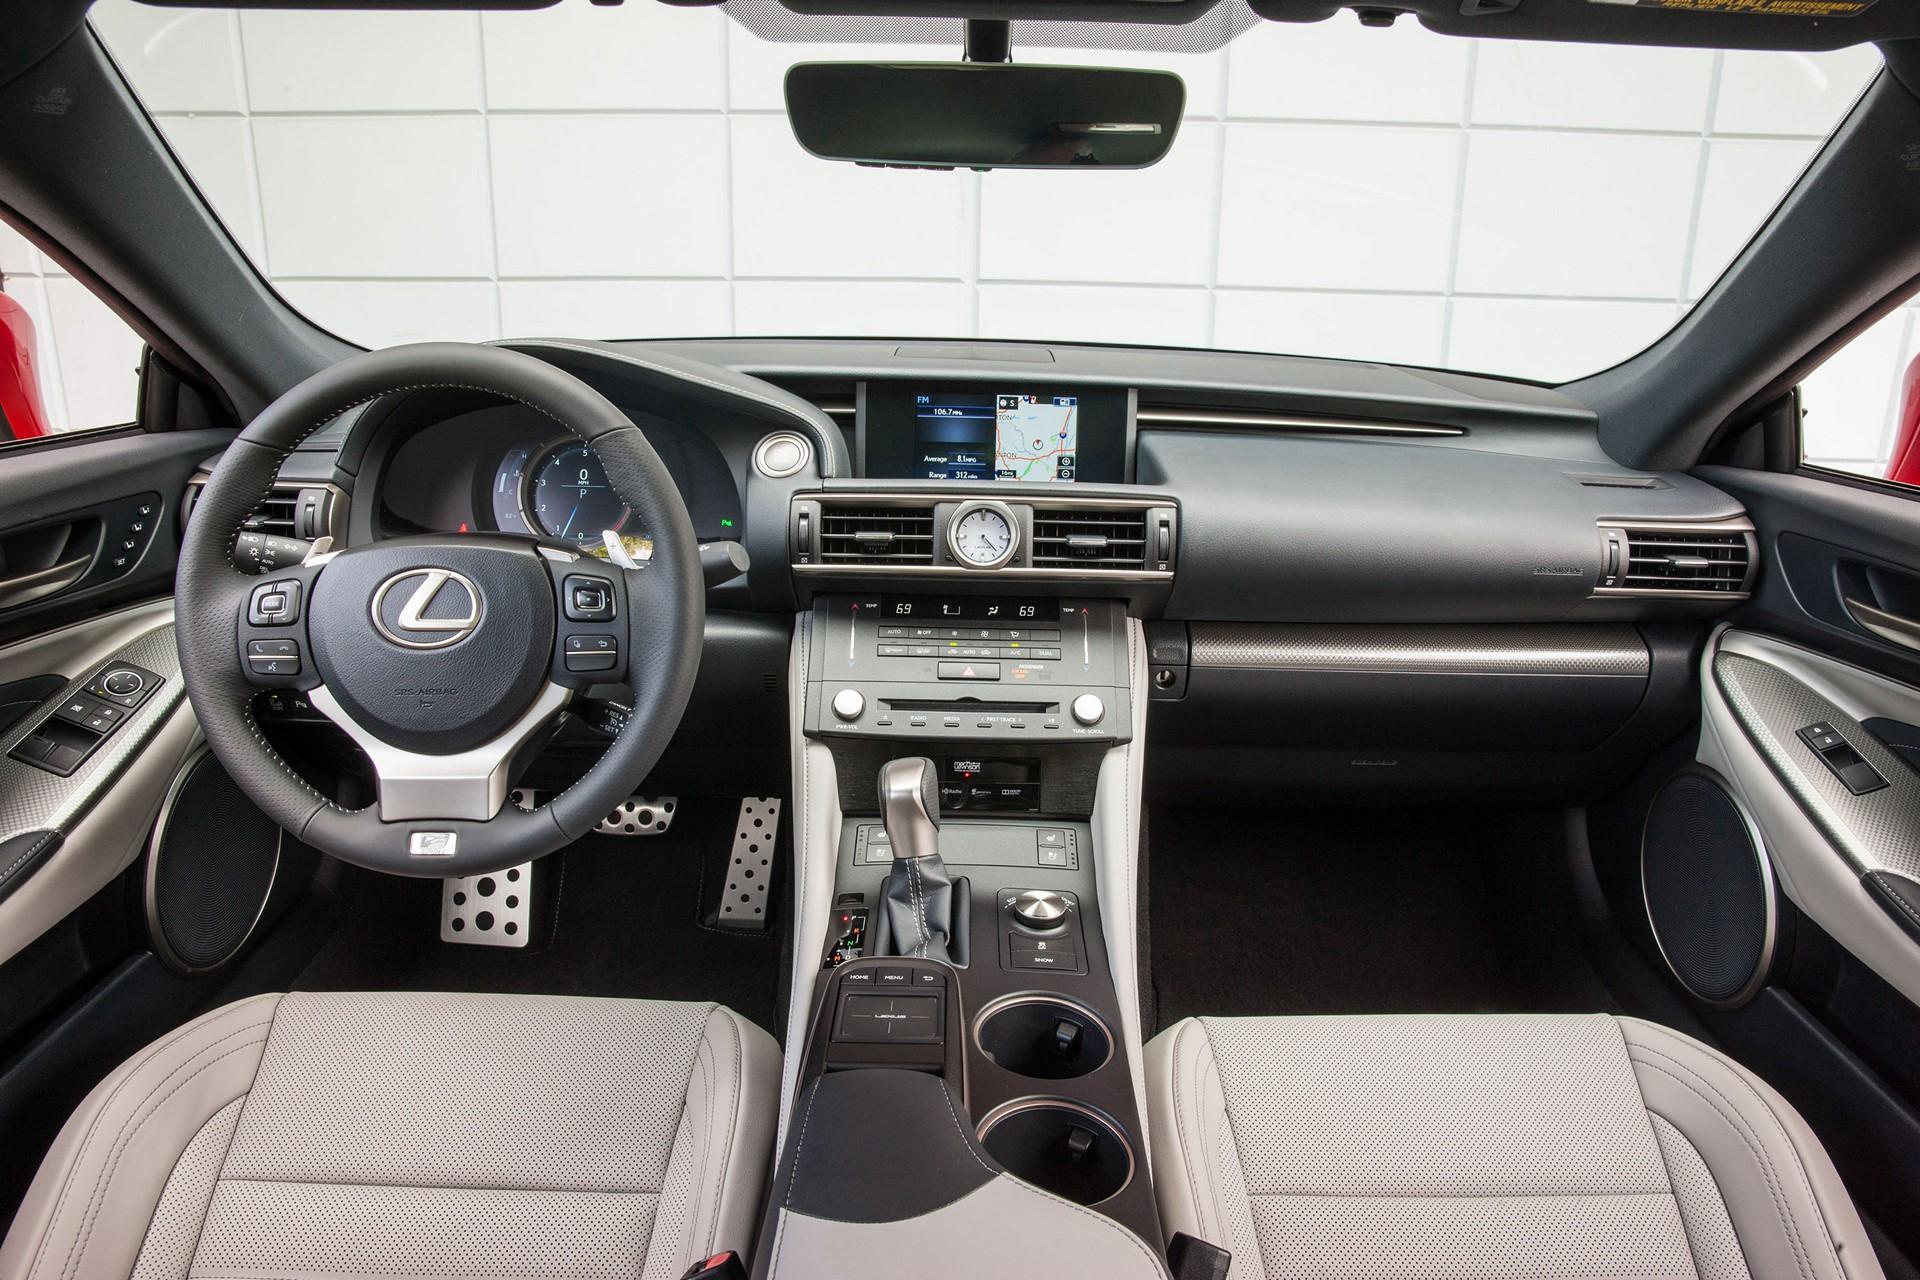 Lease Trade 2015 Lexus RC350 F SPORT AWD Rare MP Orange $498